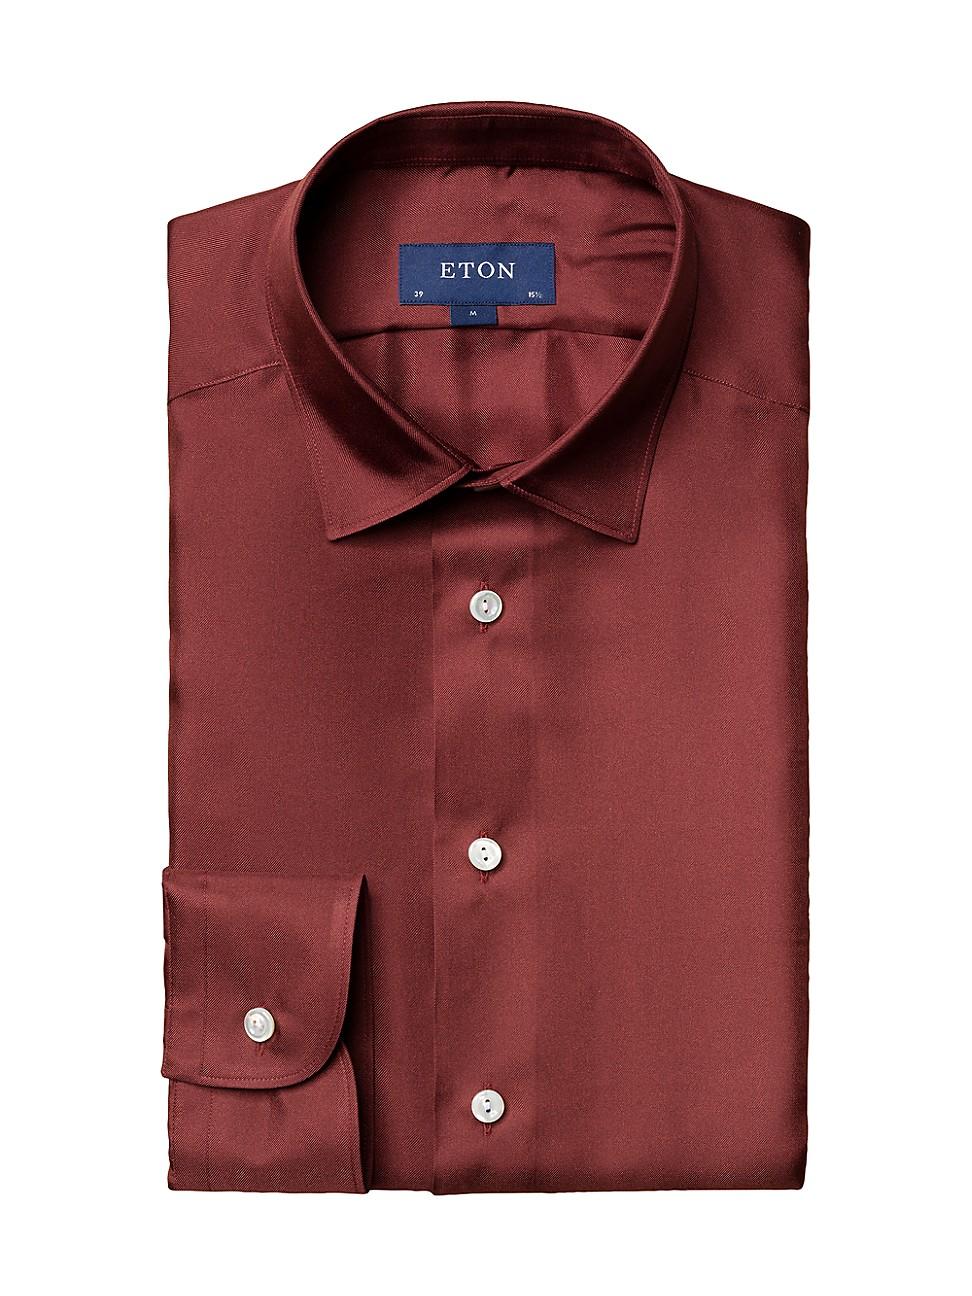 Eton MEN'S SLIM-FIT TEXTURED SOLID DRESS SHIRT